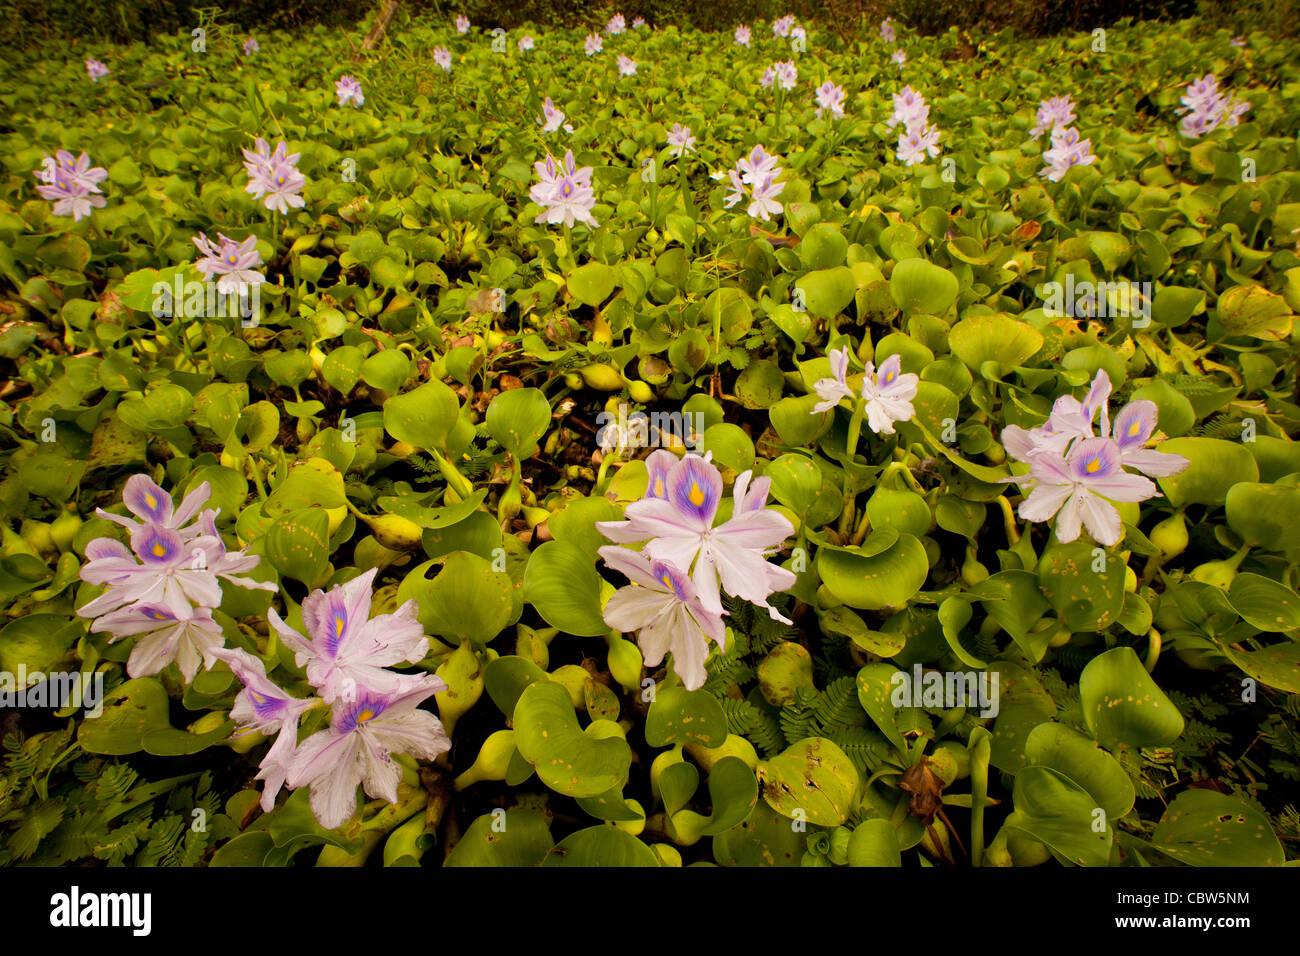 Beautiful flowers at Refugio de vida Silvestre Cienaga las Macanas, Herrera province, Republic of Panama. Stock Photo